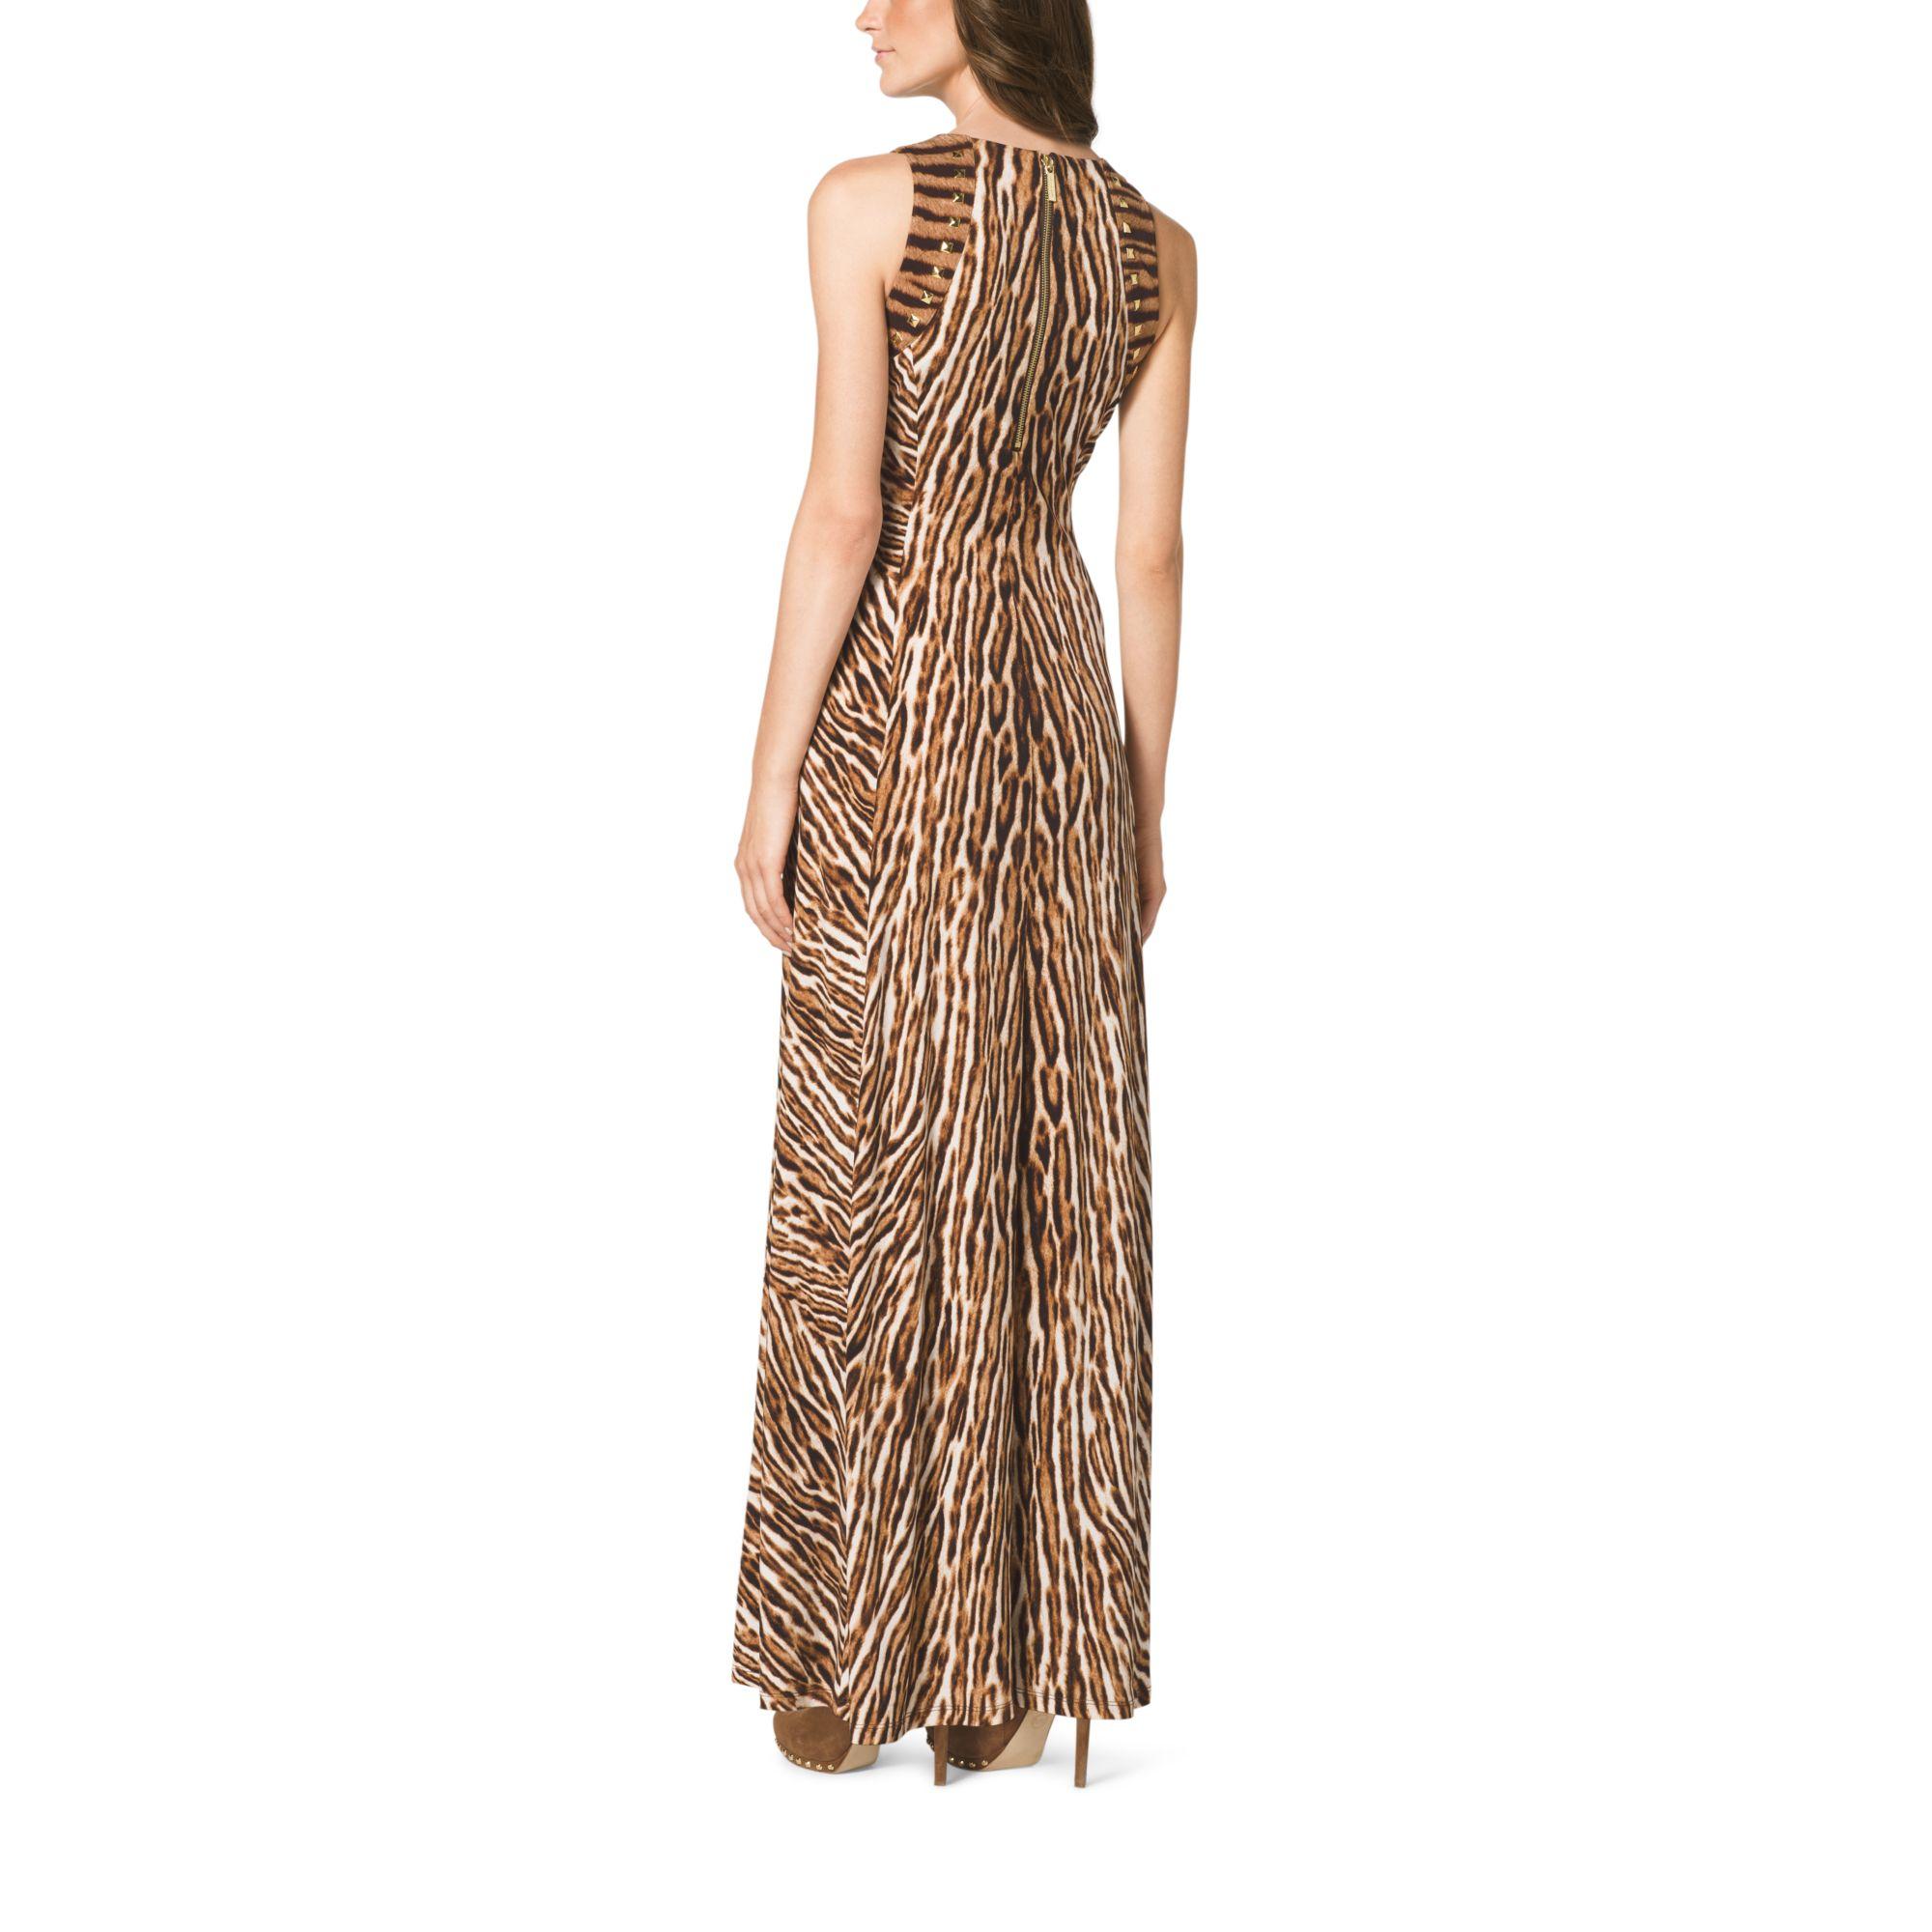 Michael kors Mixed Animal-Print Maxi Dress | Lyst